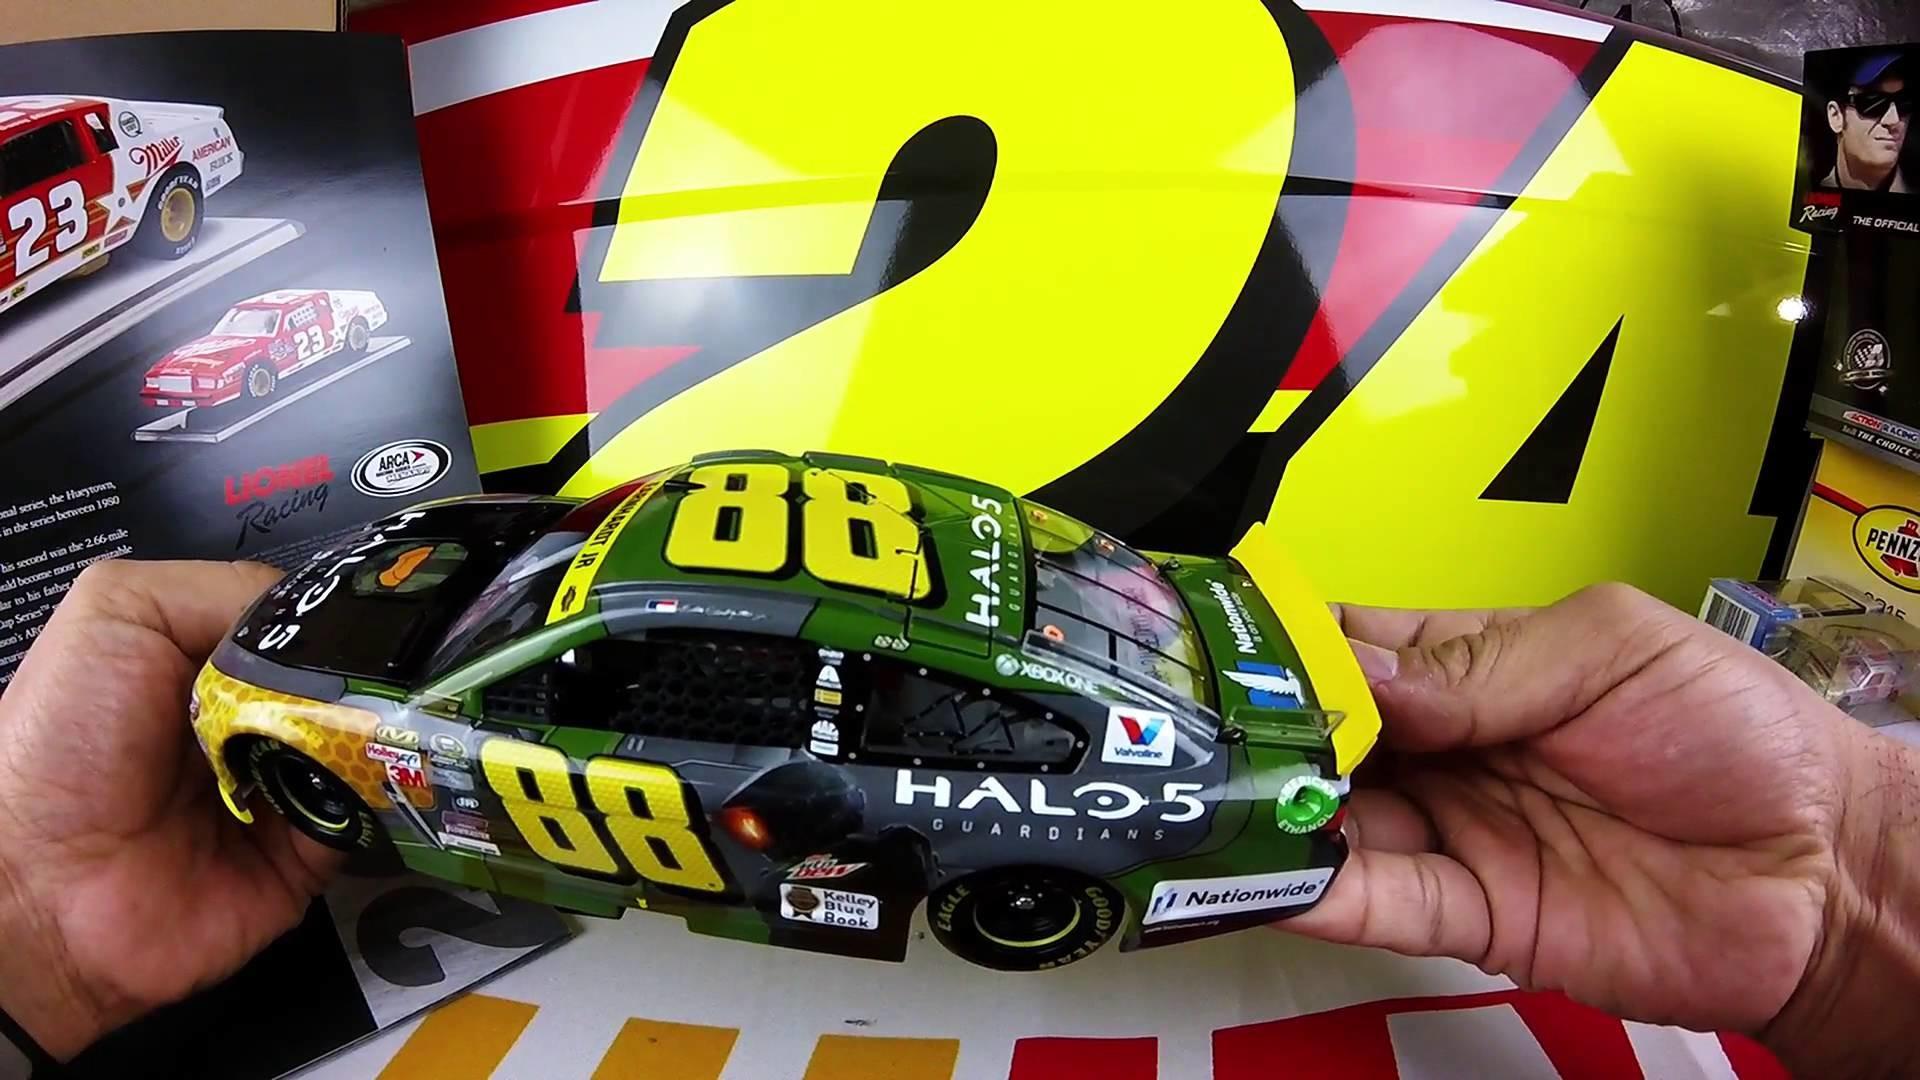 Unboxing the 2015 Dale Earnhardt Jr #88 Halo 5 Special 1/24 NASCAR Diecast